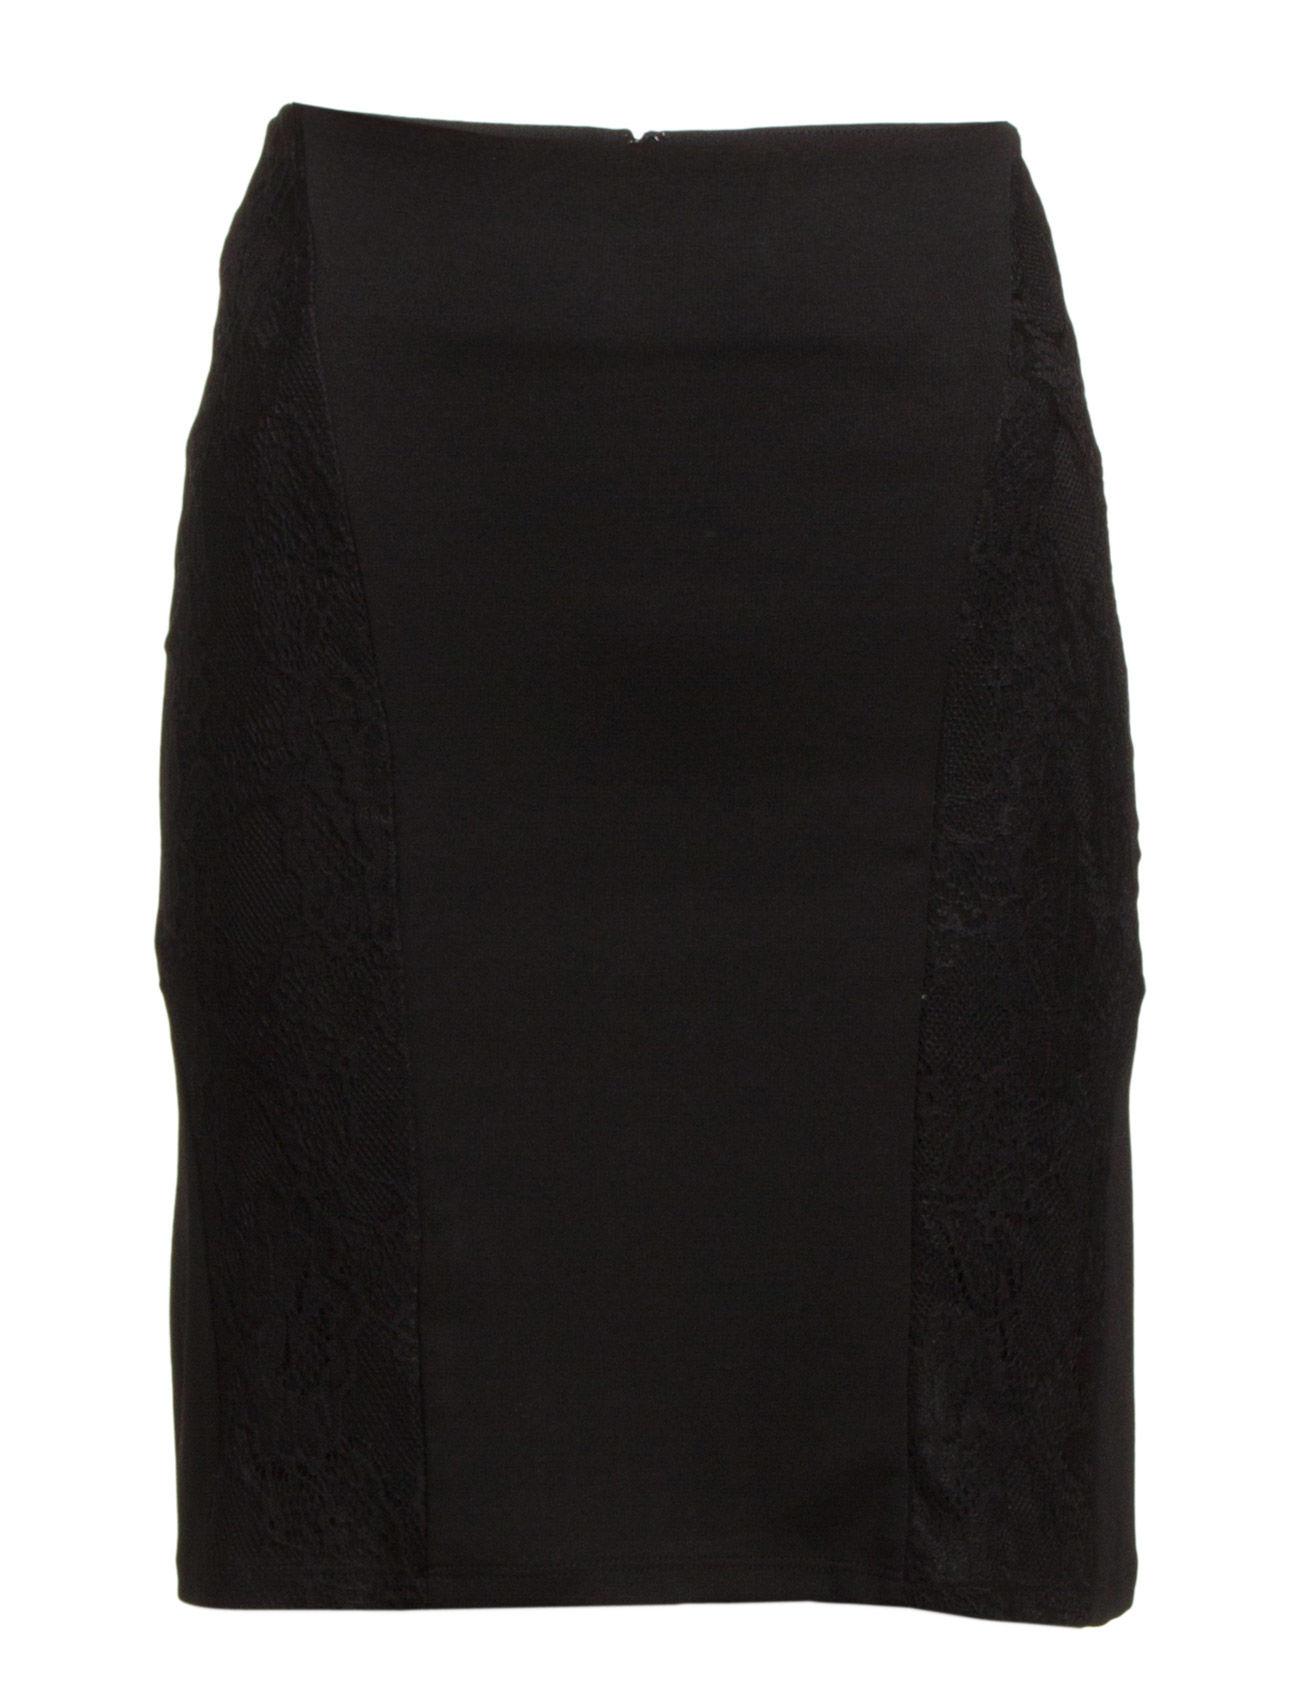 Marlaw Skirt